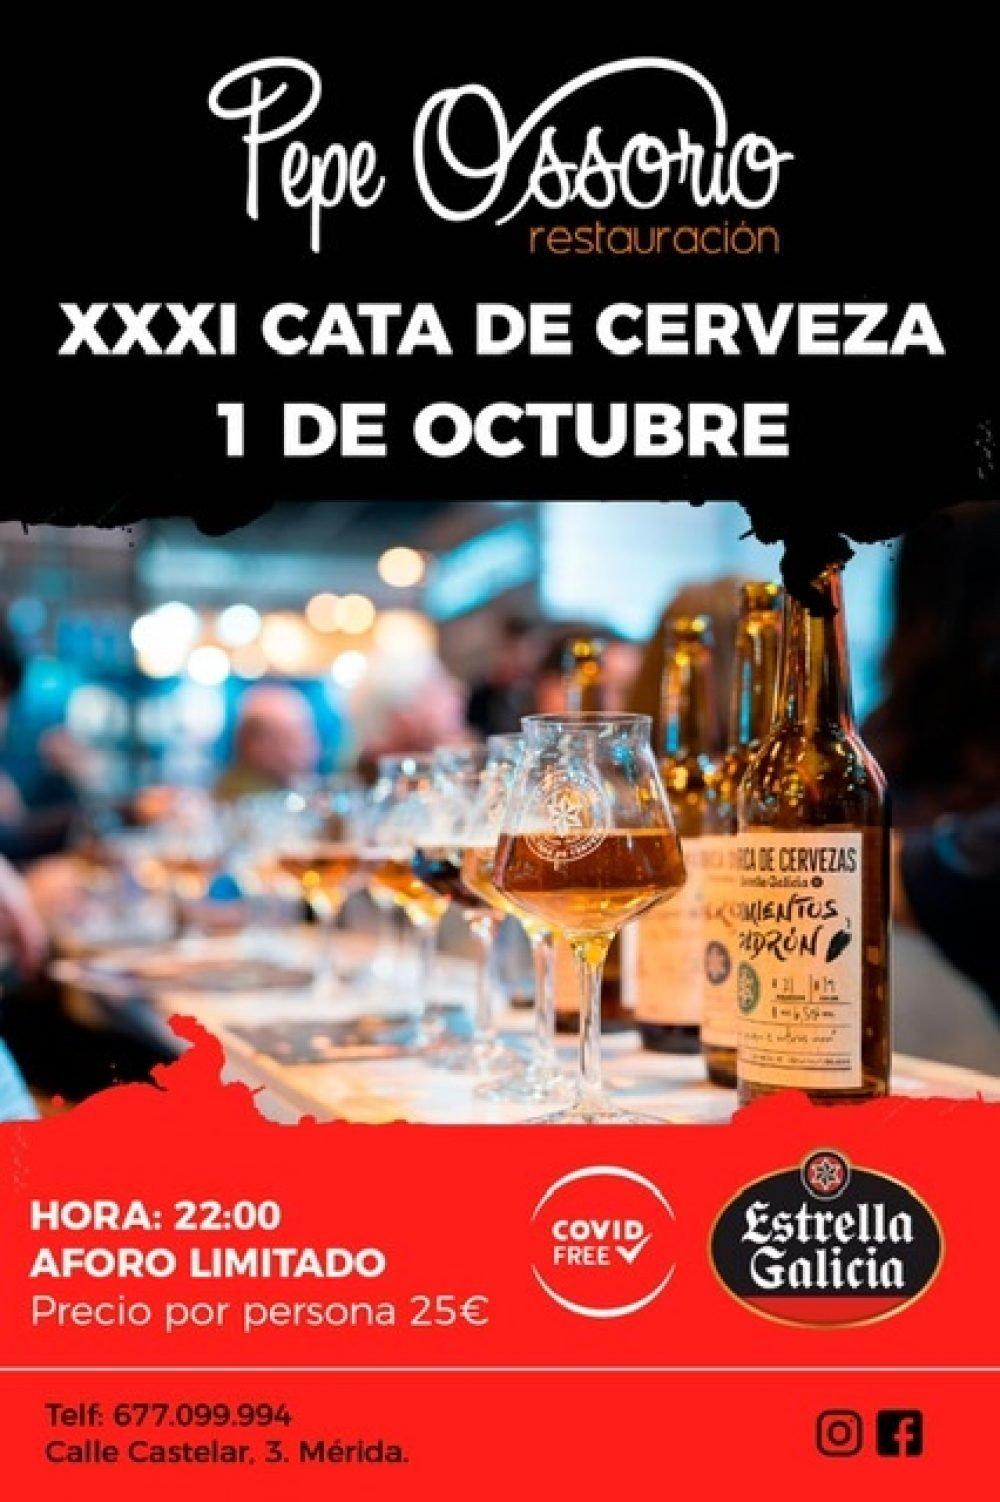 XXXI Cata de cerveza